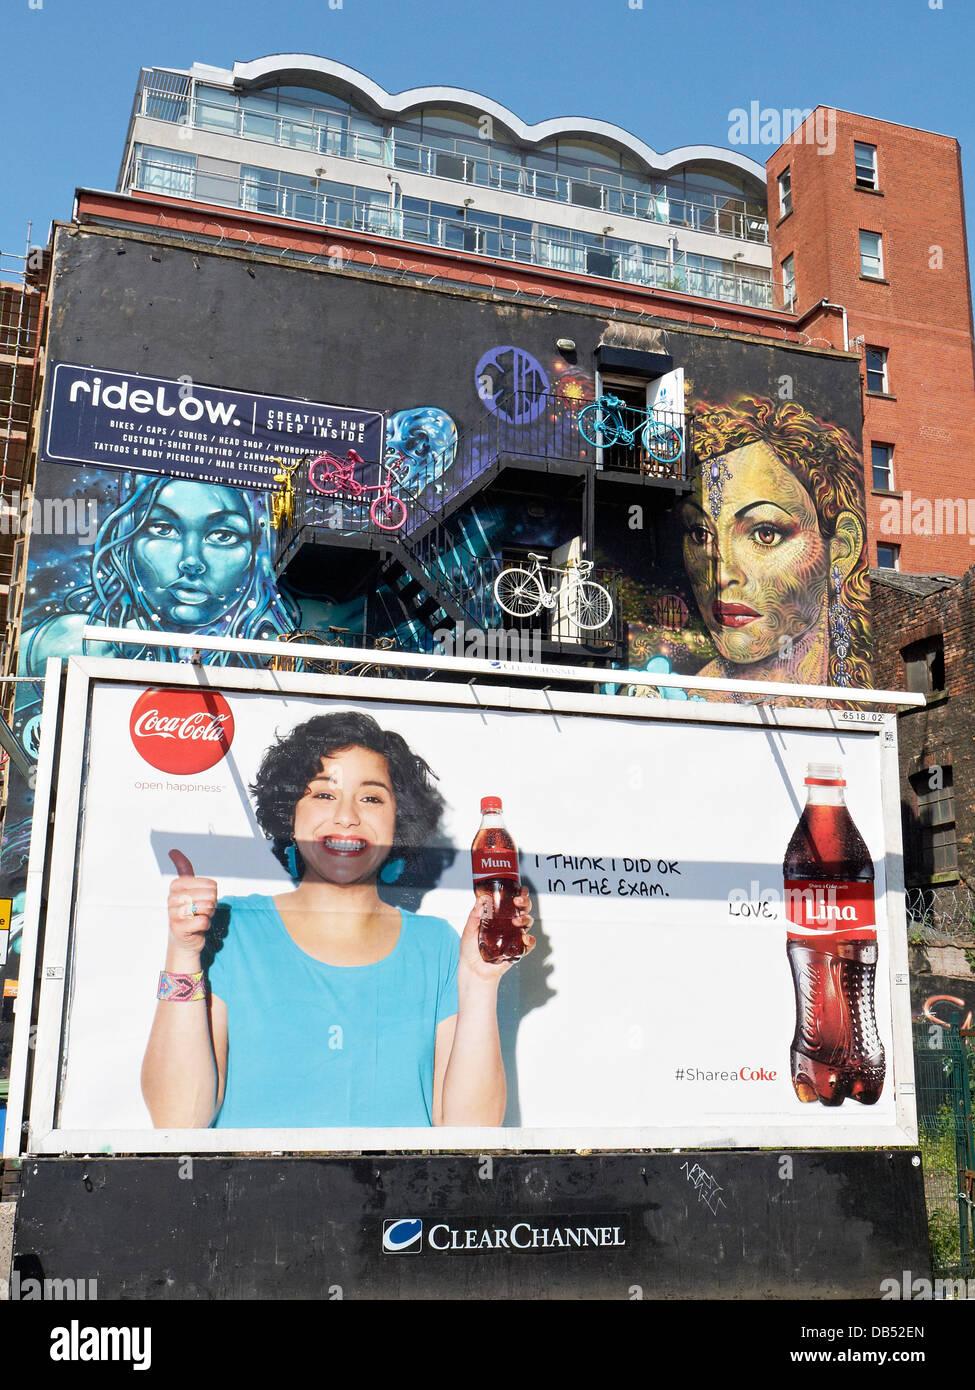 Coca Cola advert UK - Stock Image